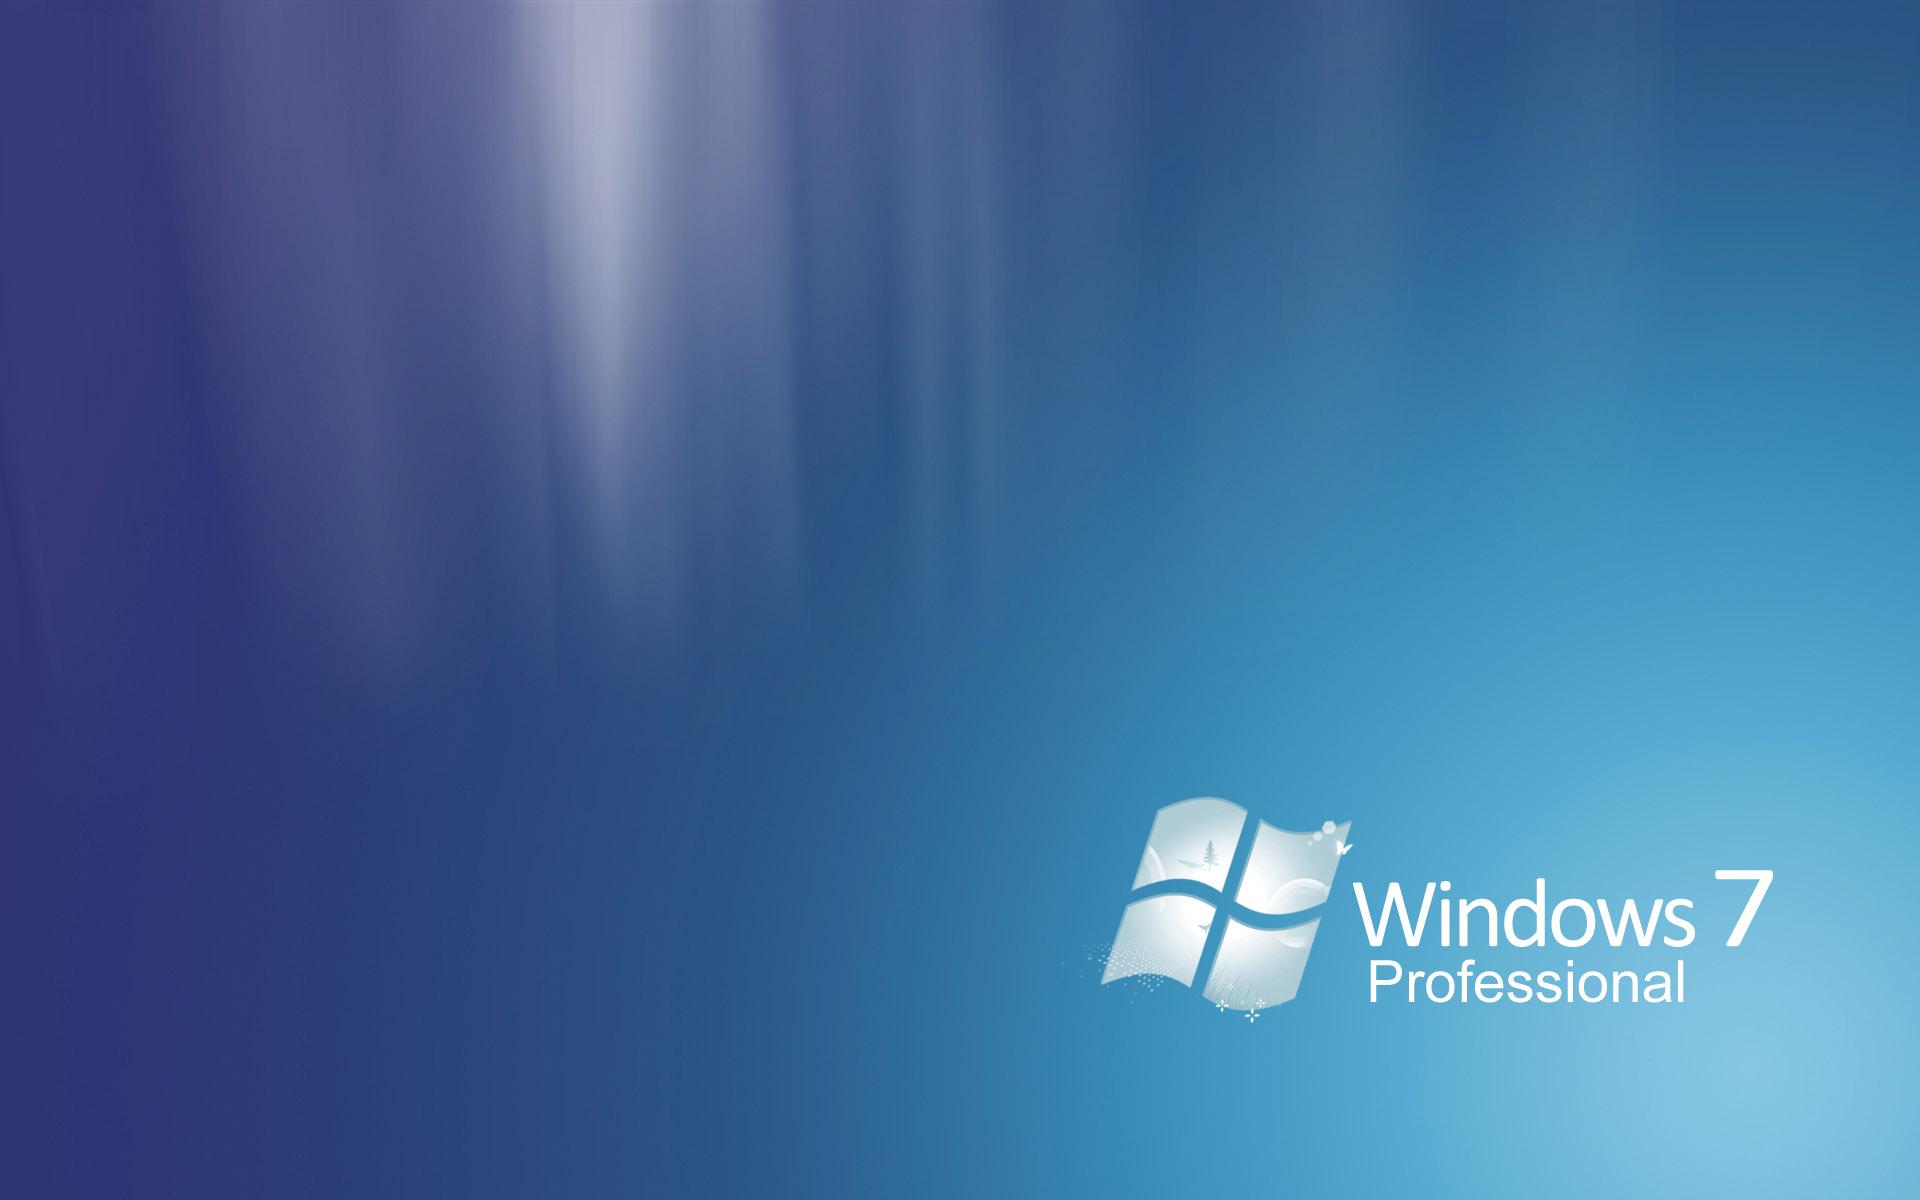 Wallpapers Windows 7